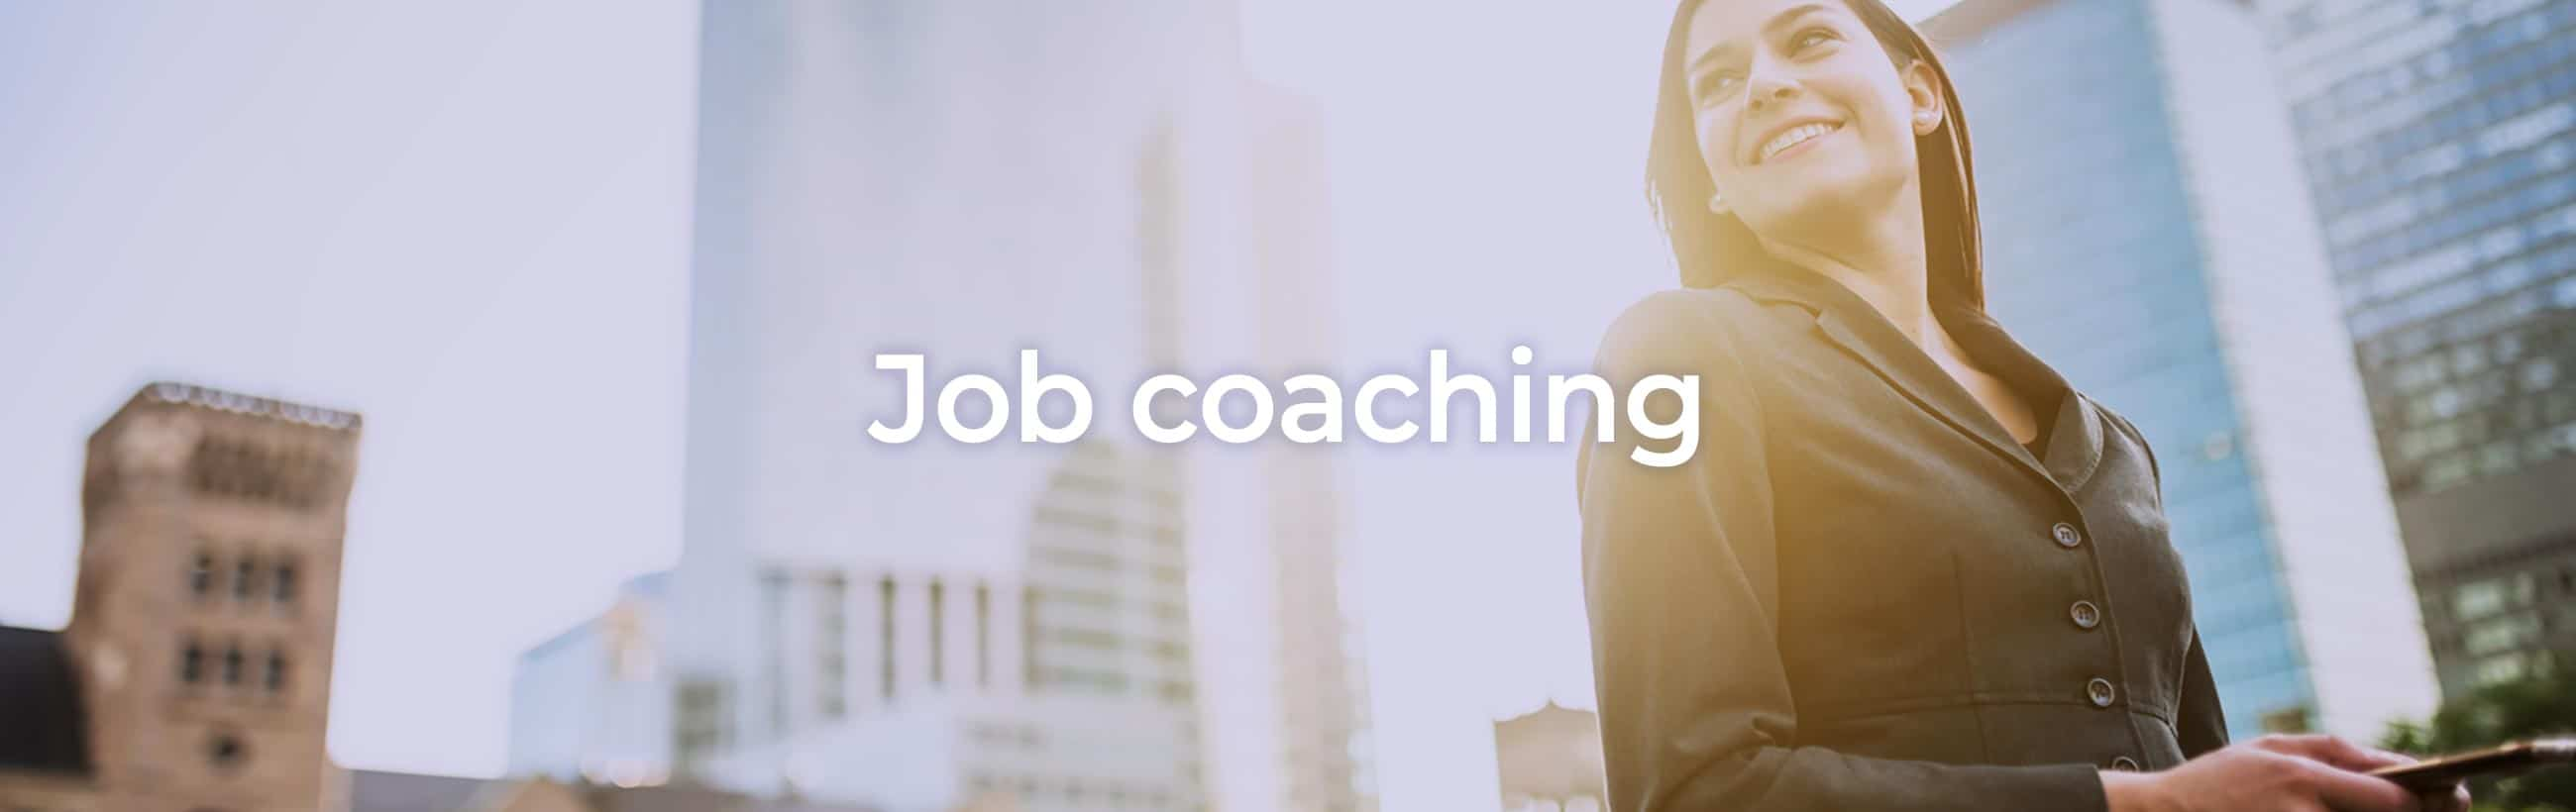 Job coaching - Blueberry Hill